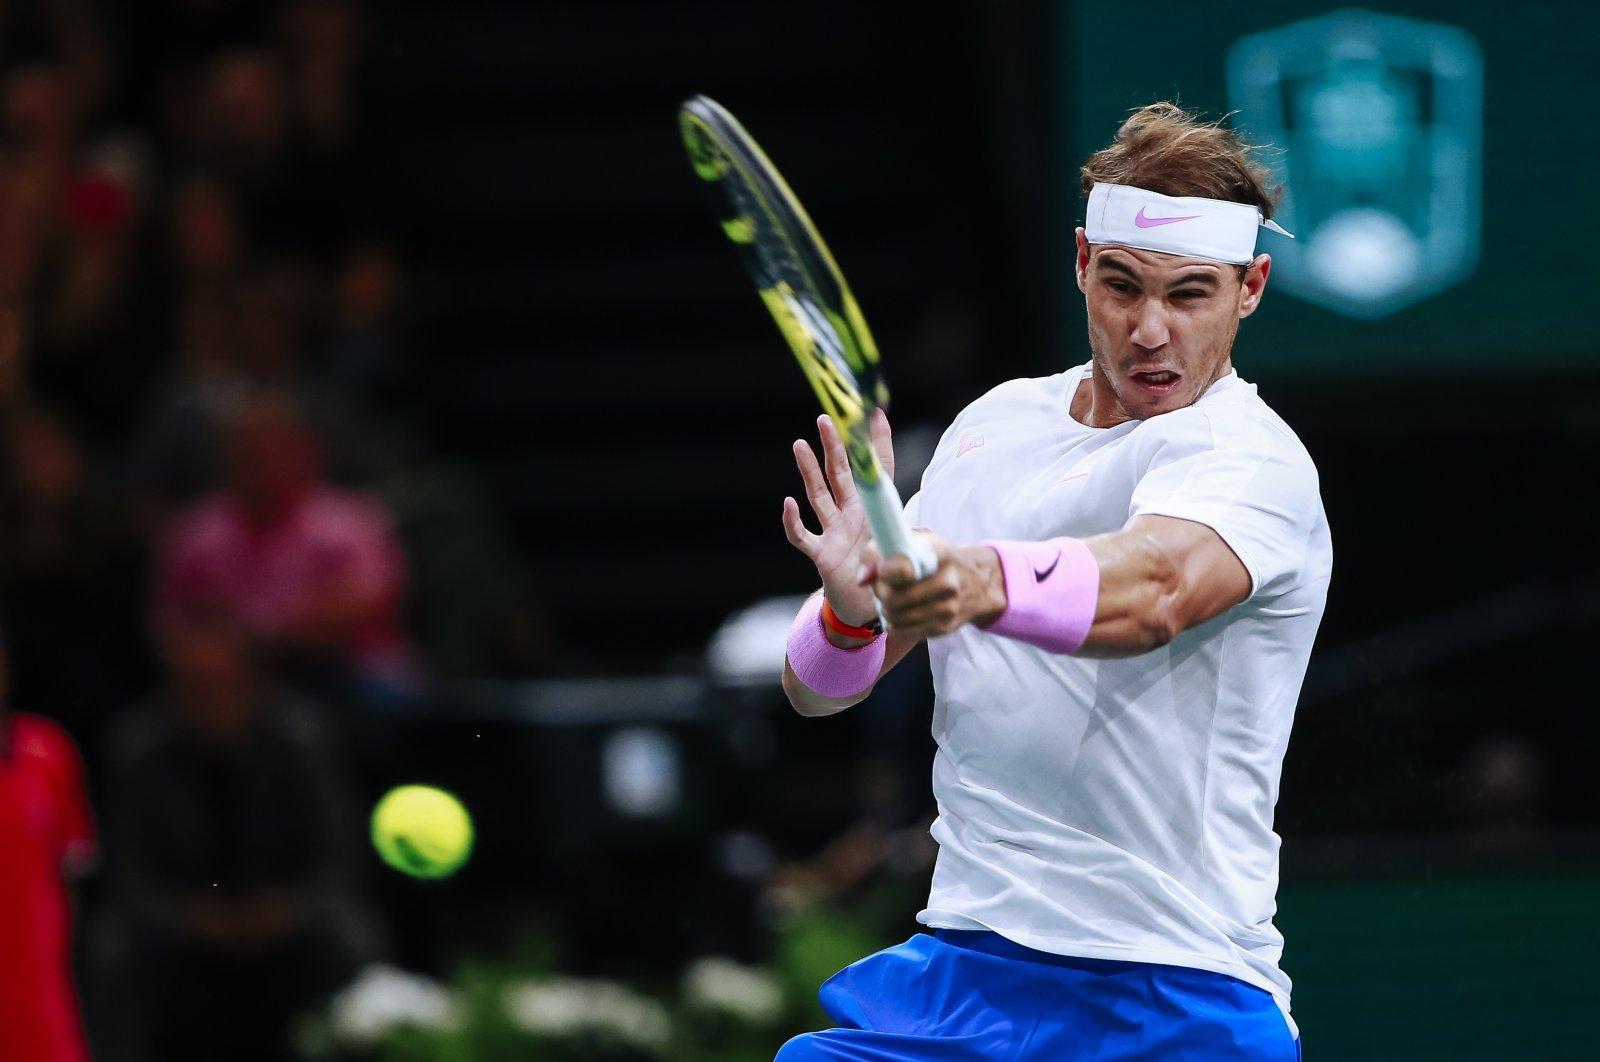 Rafael Nadal in action during a Paris Masters quarterfinal match against Jo Wilfried Tsonga, in Paris, France, Nov. 1, 2019. (AP Photo)